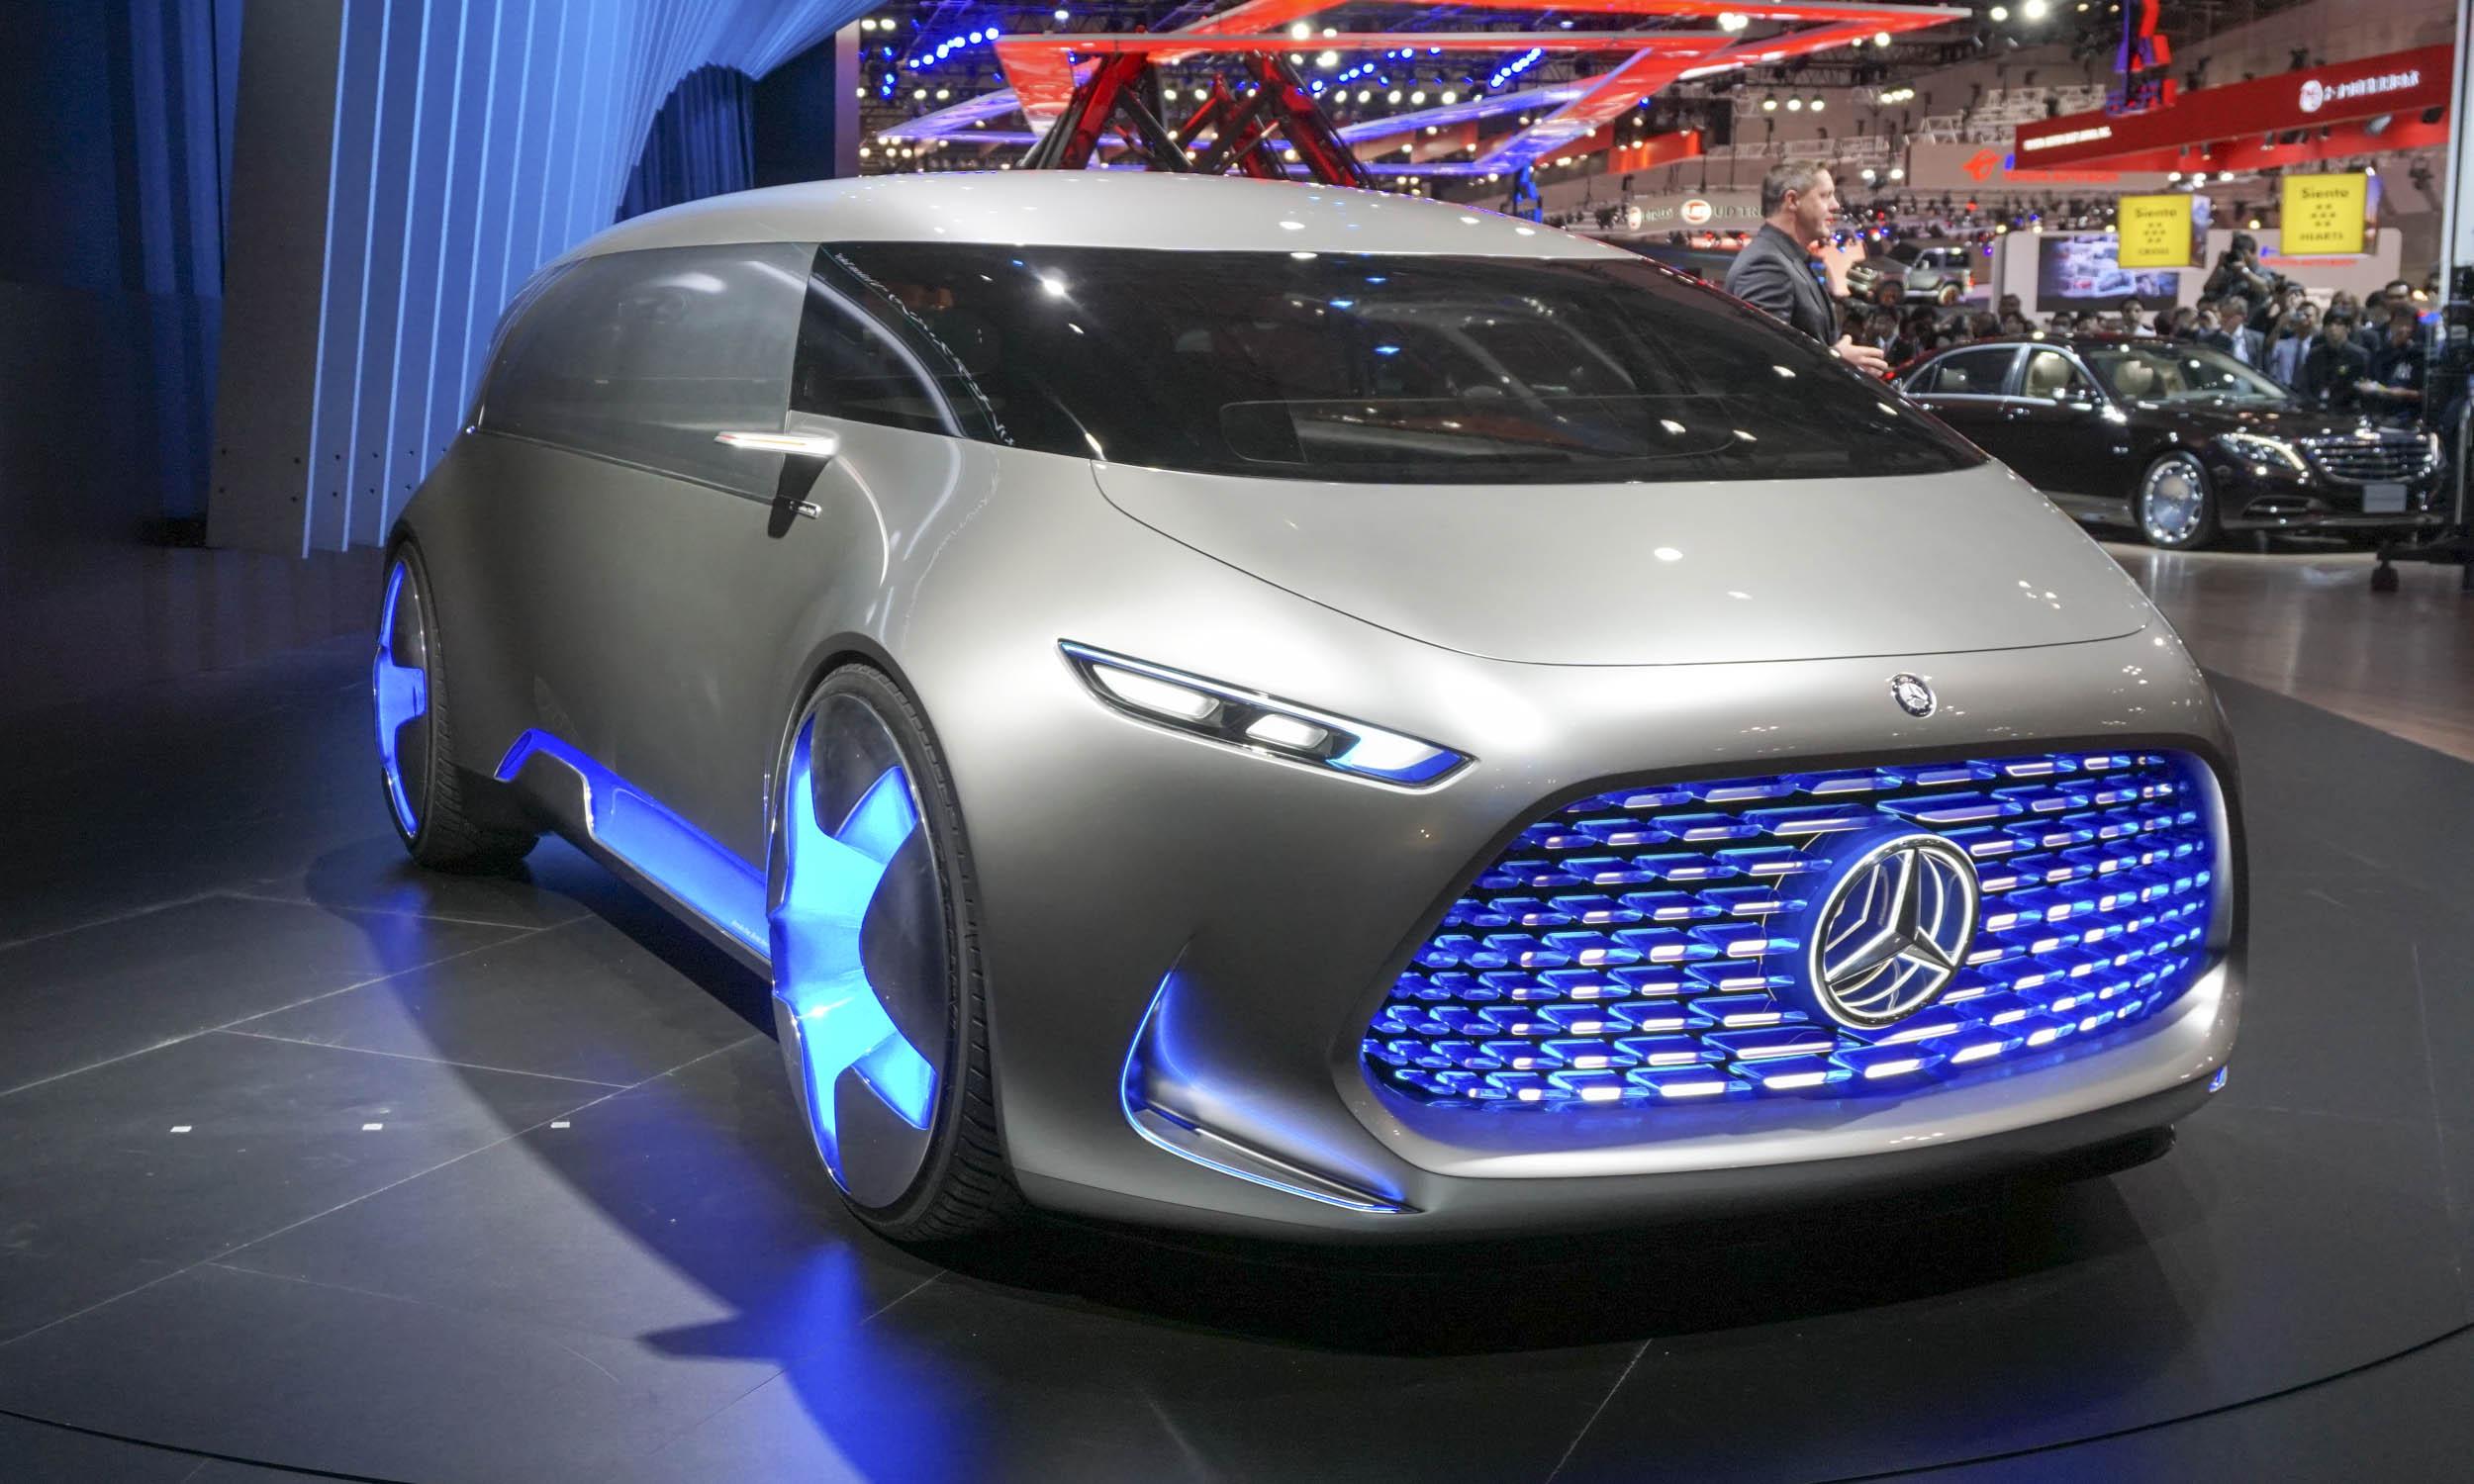 Mercedes-Benz bez konkurencije u vidu BMW-a i Audija u Tokiju